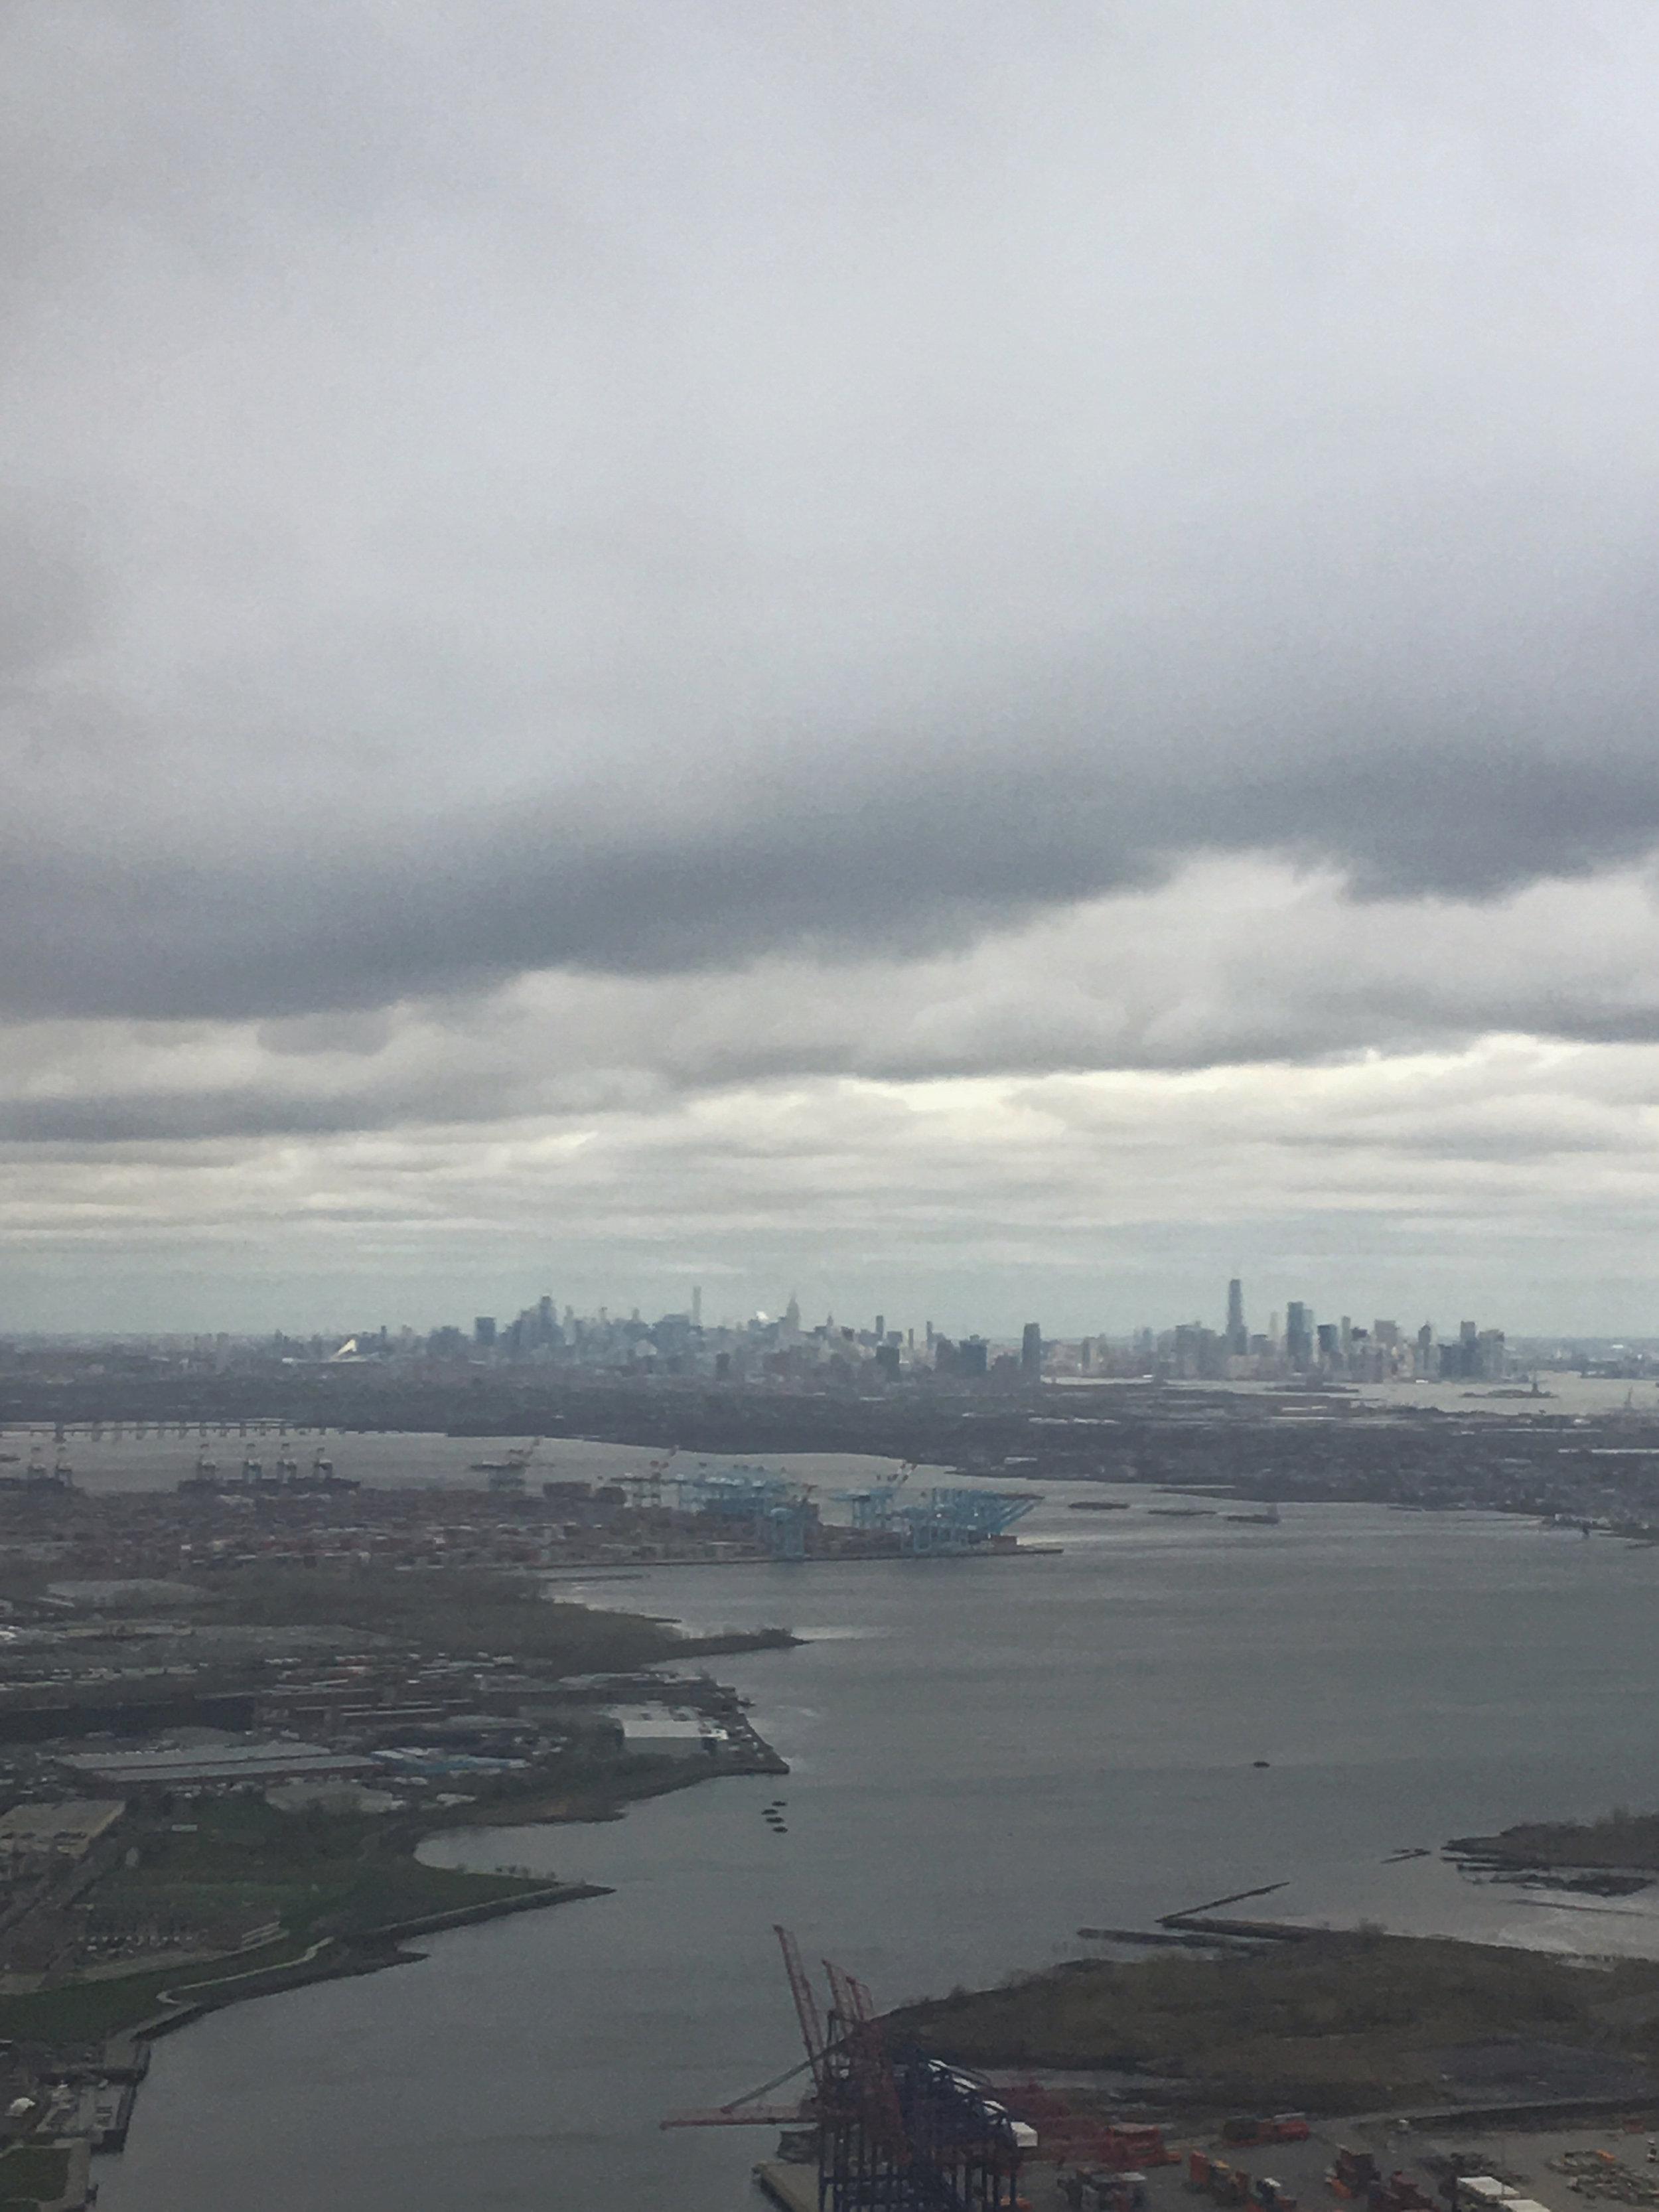 NYC, Que tal!?